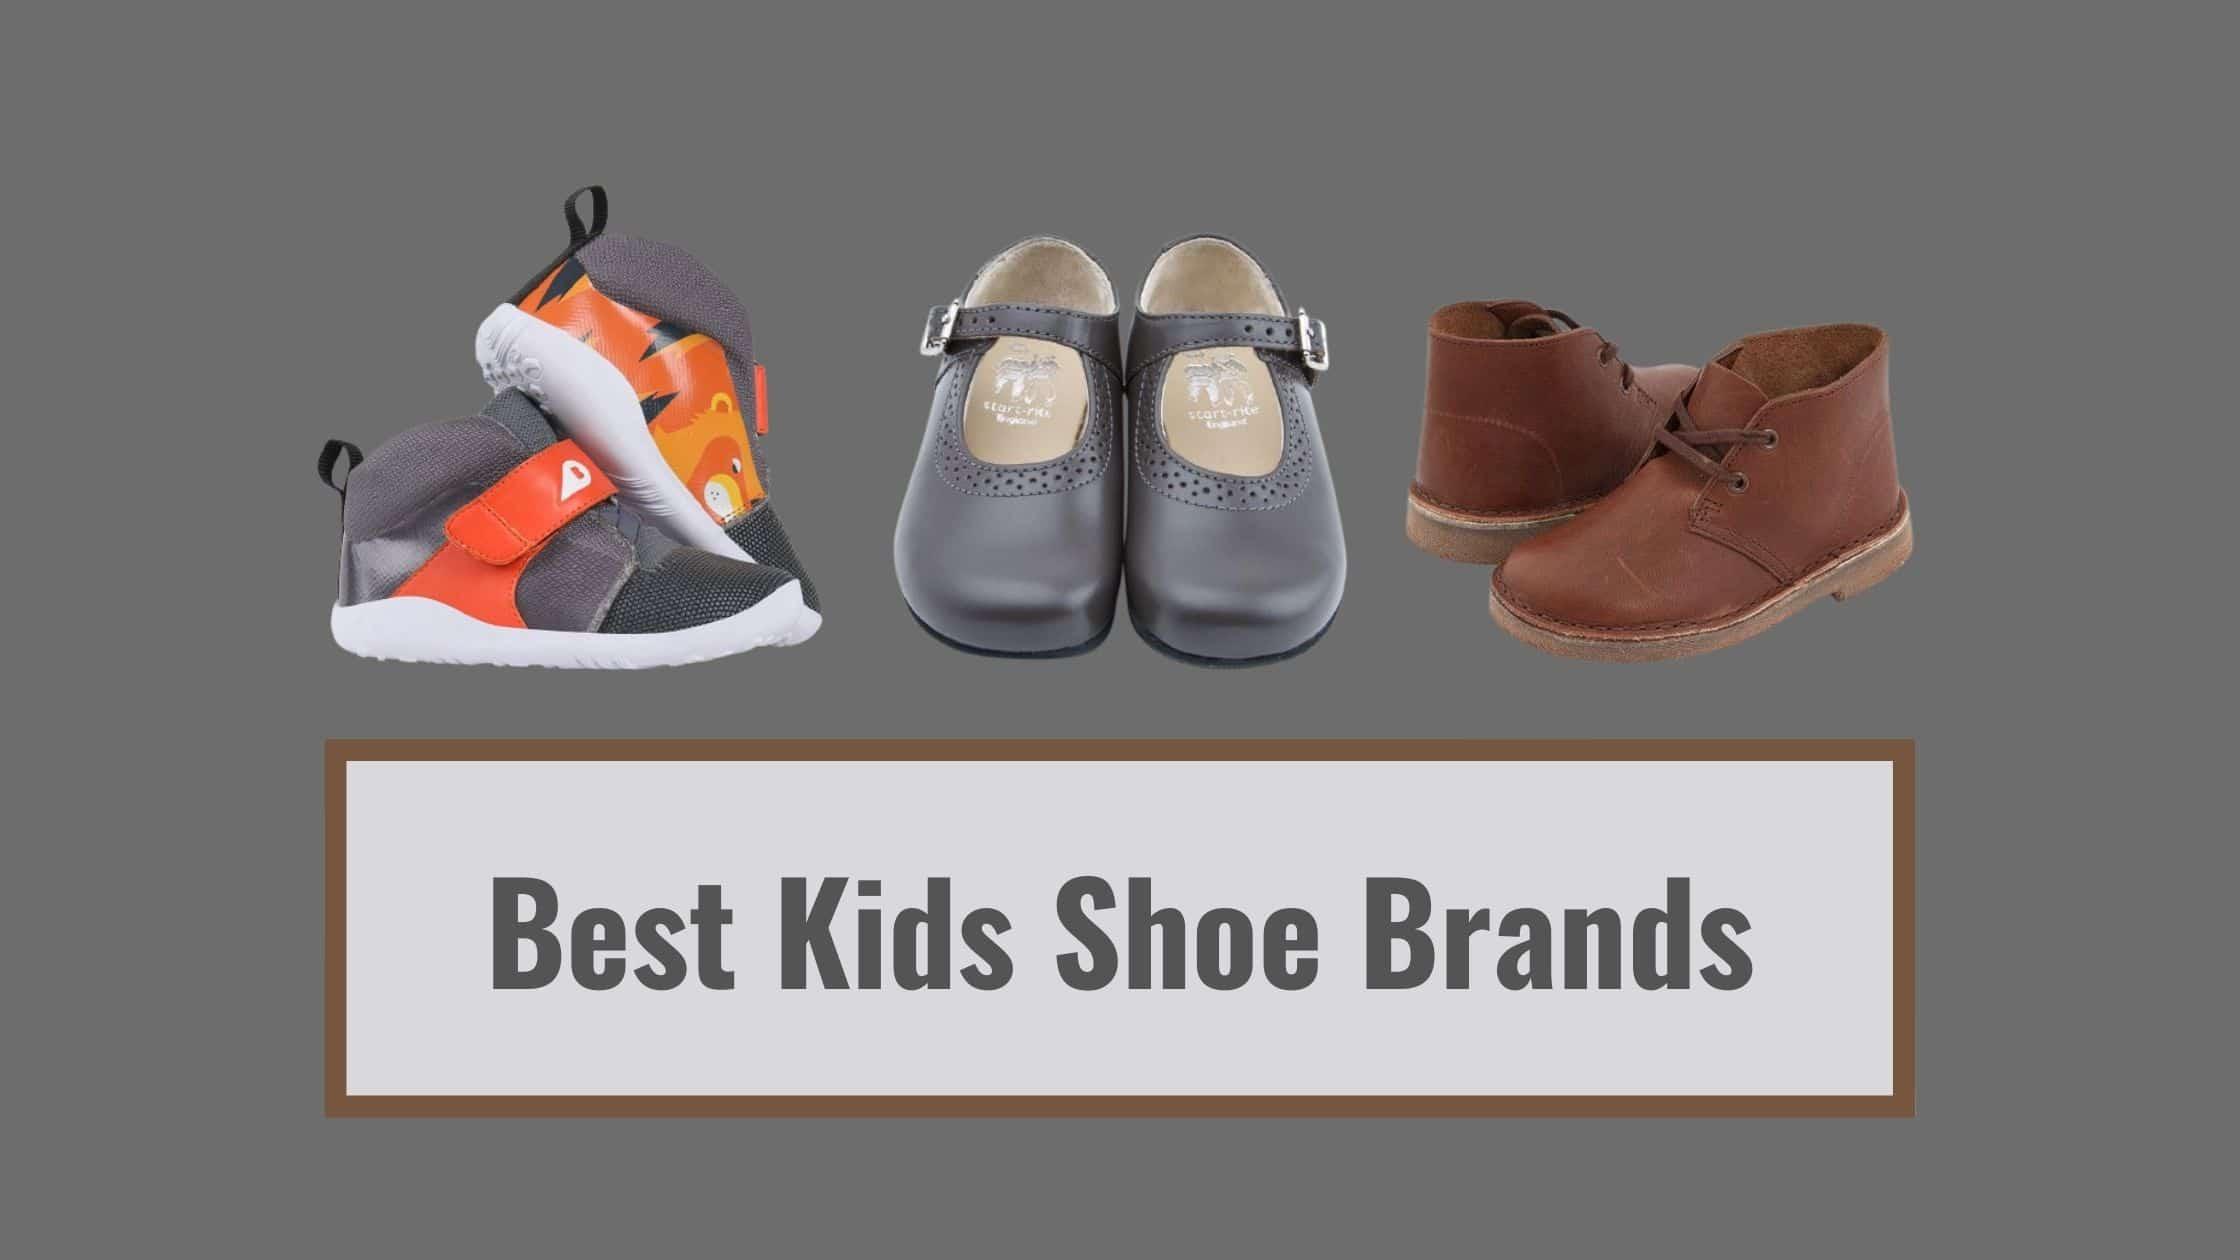 Best Kids Shoe Brands